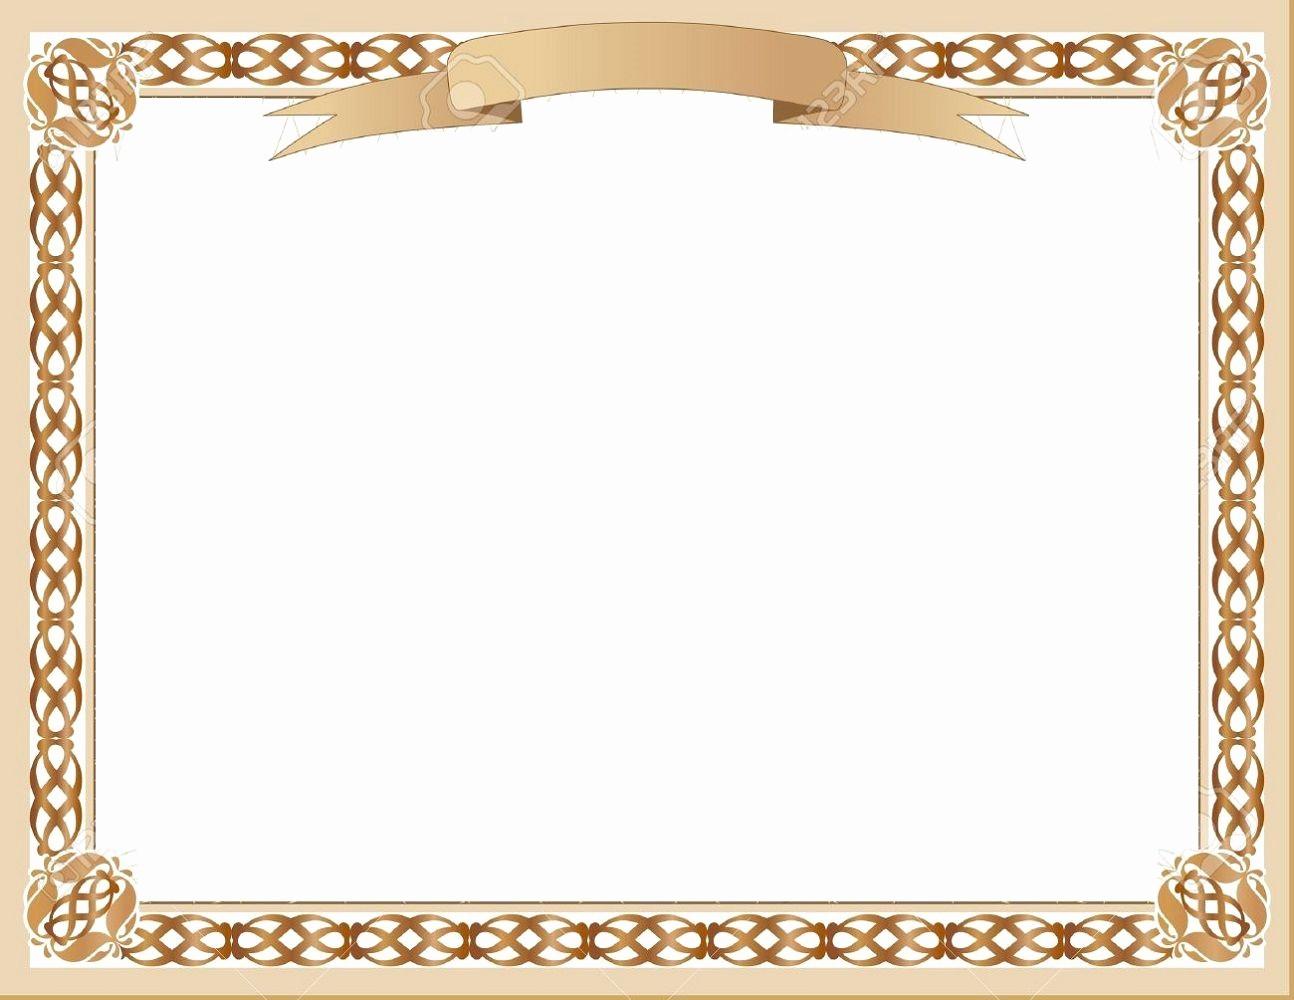 Certificate Background Design Free Download Unique Blank Certificate Designs Template Border Design